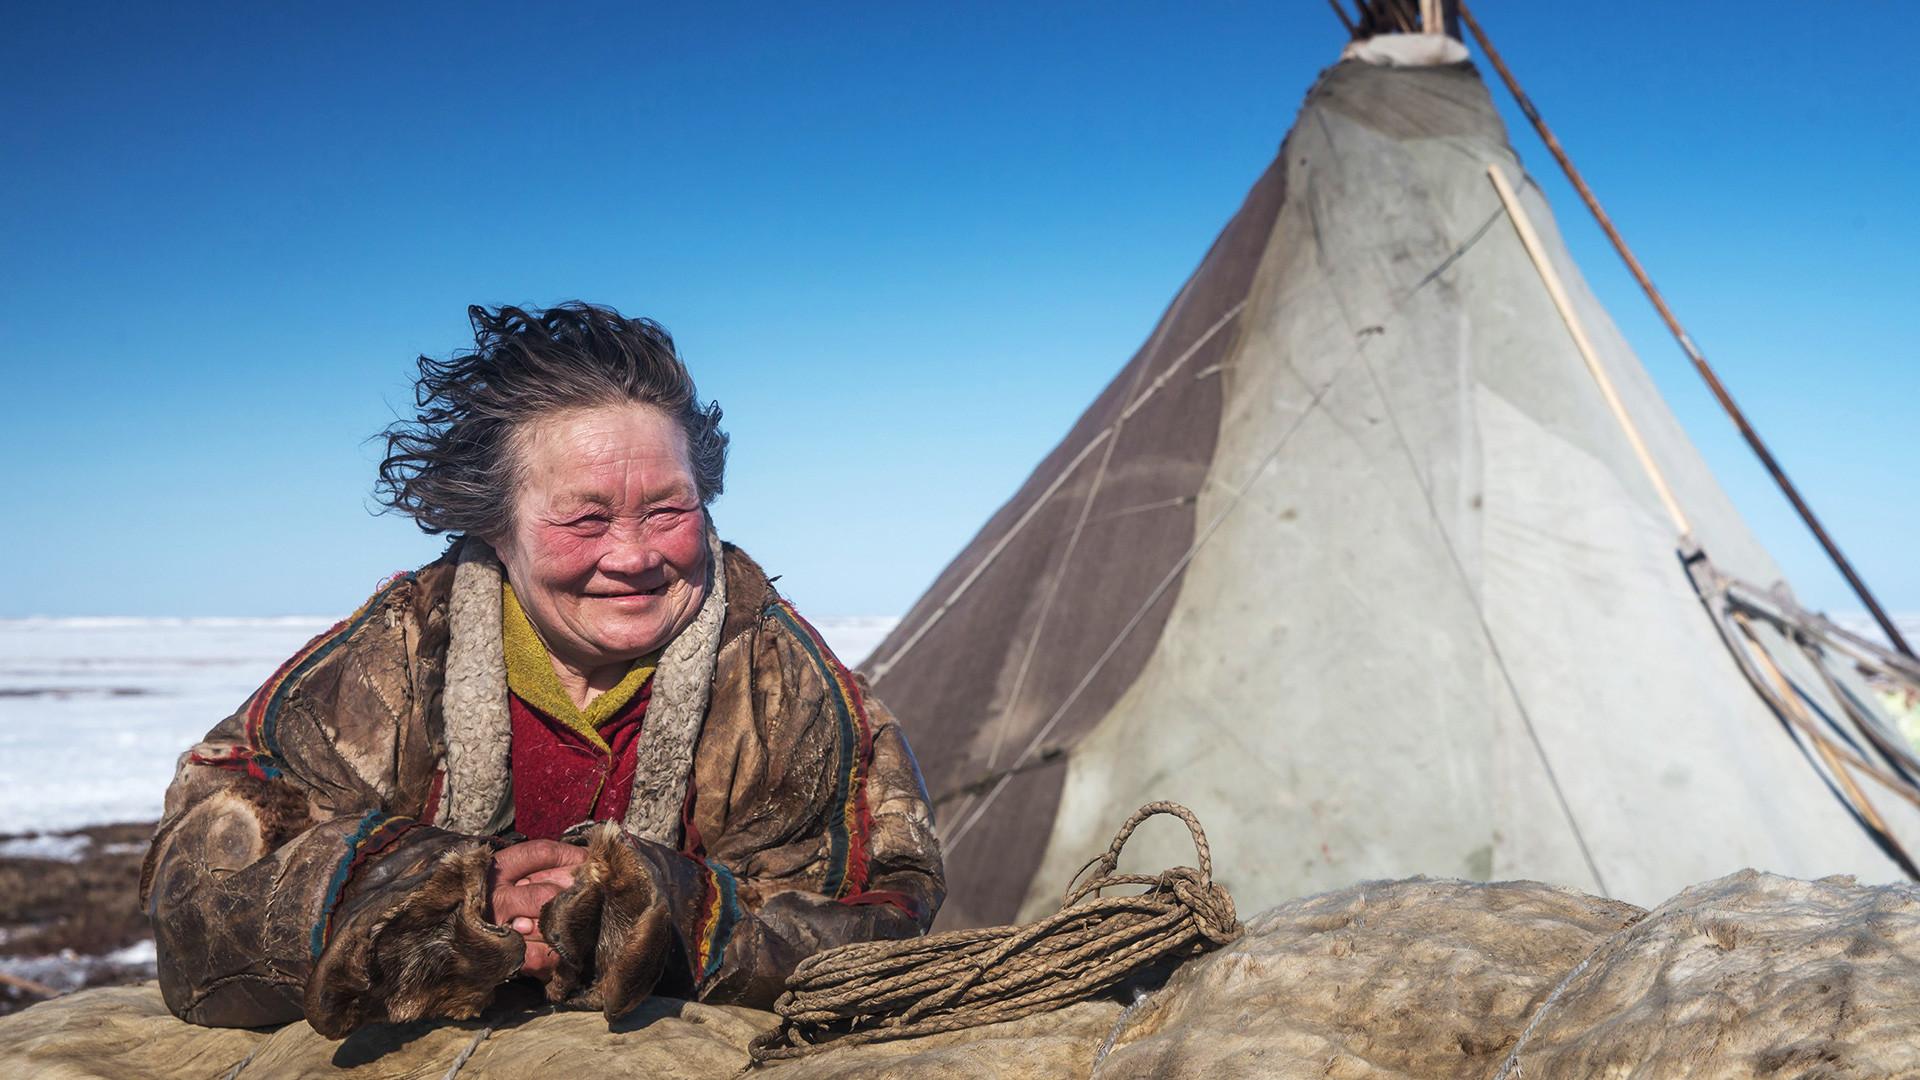 Femme nomade en Iamalie, 2016